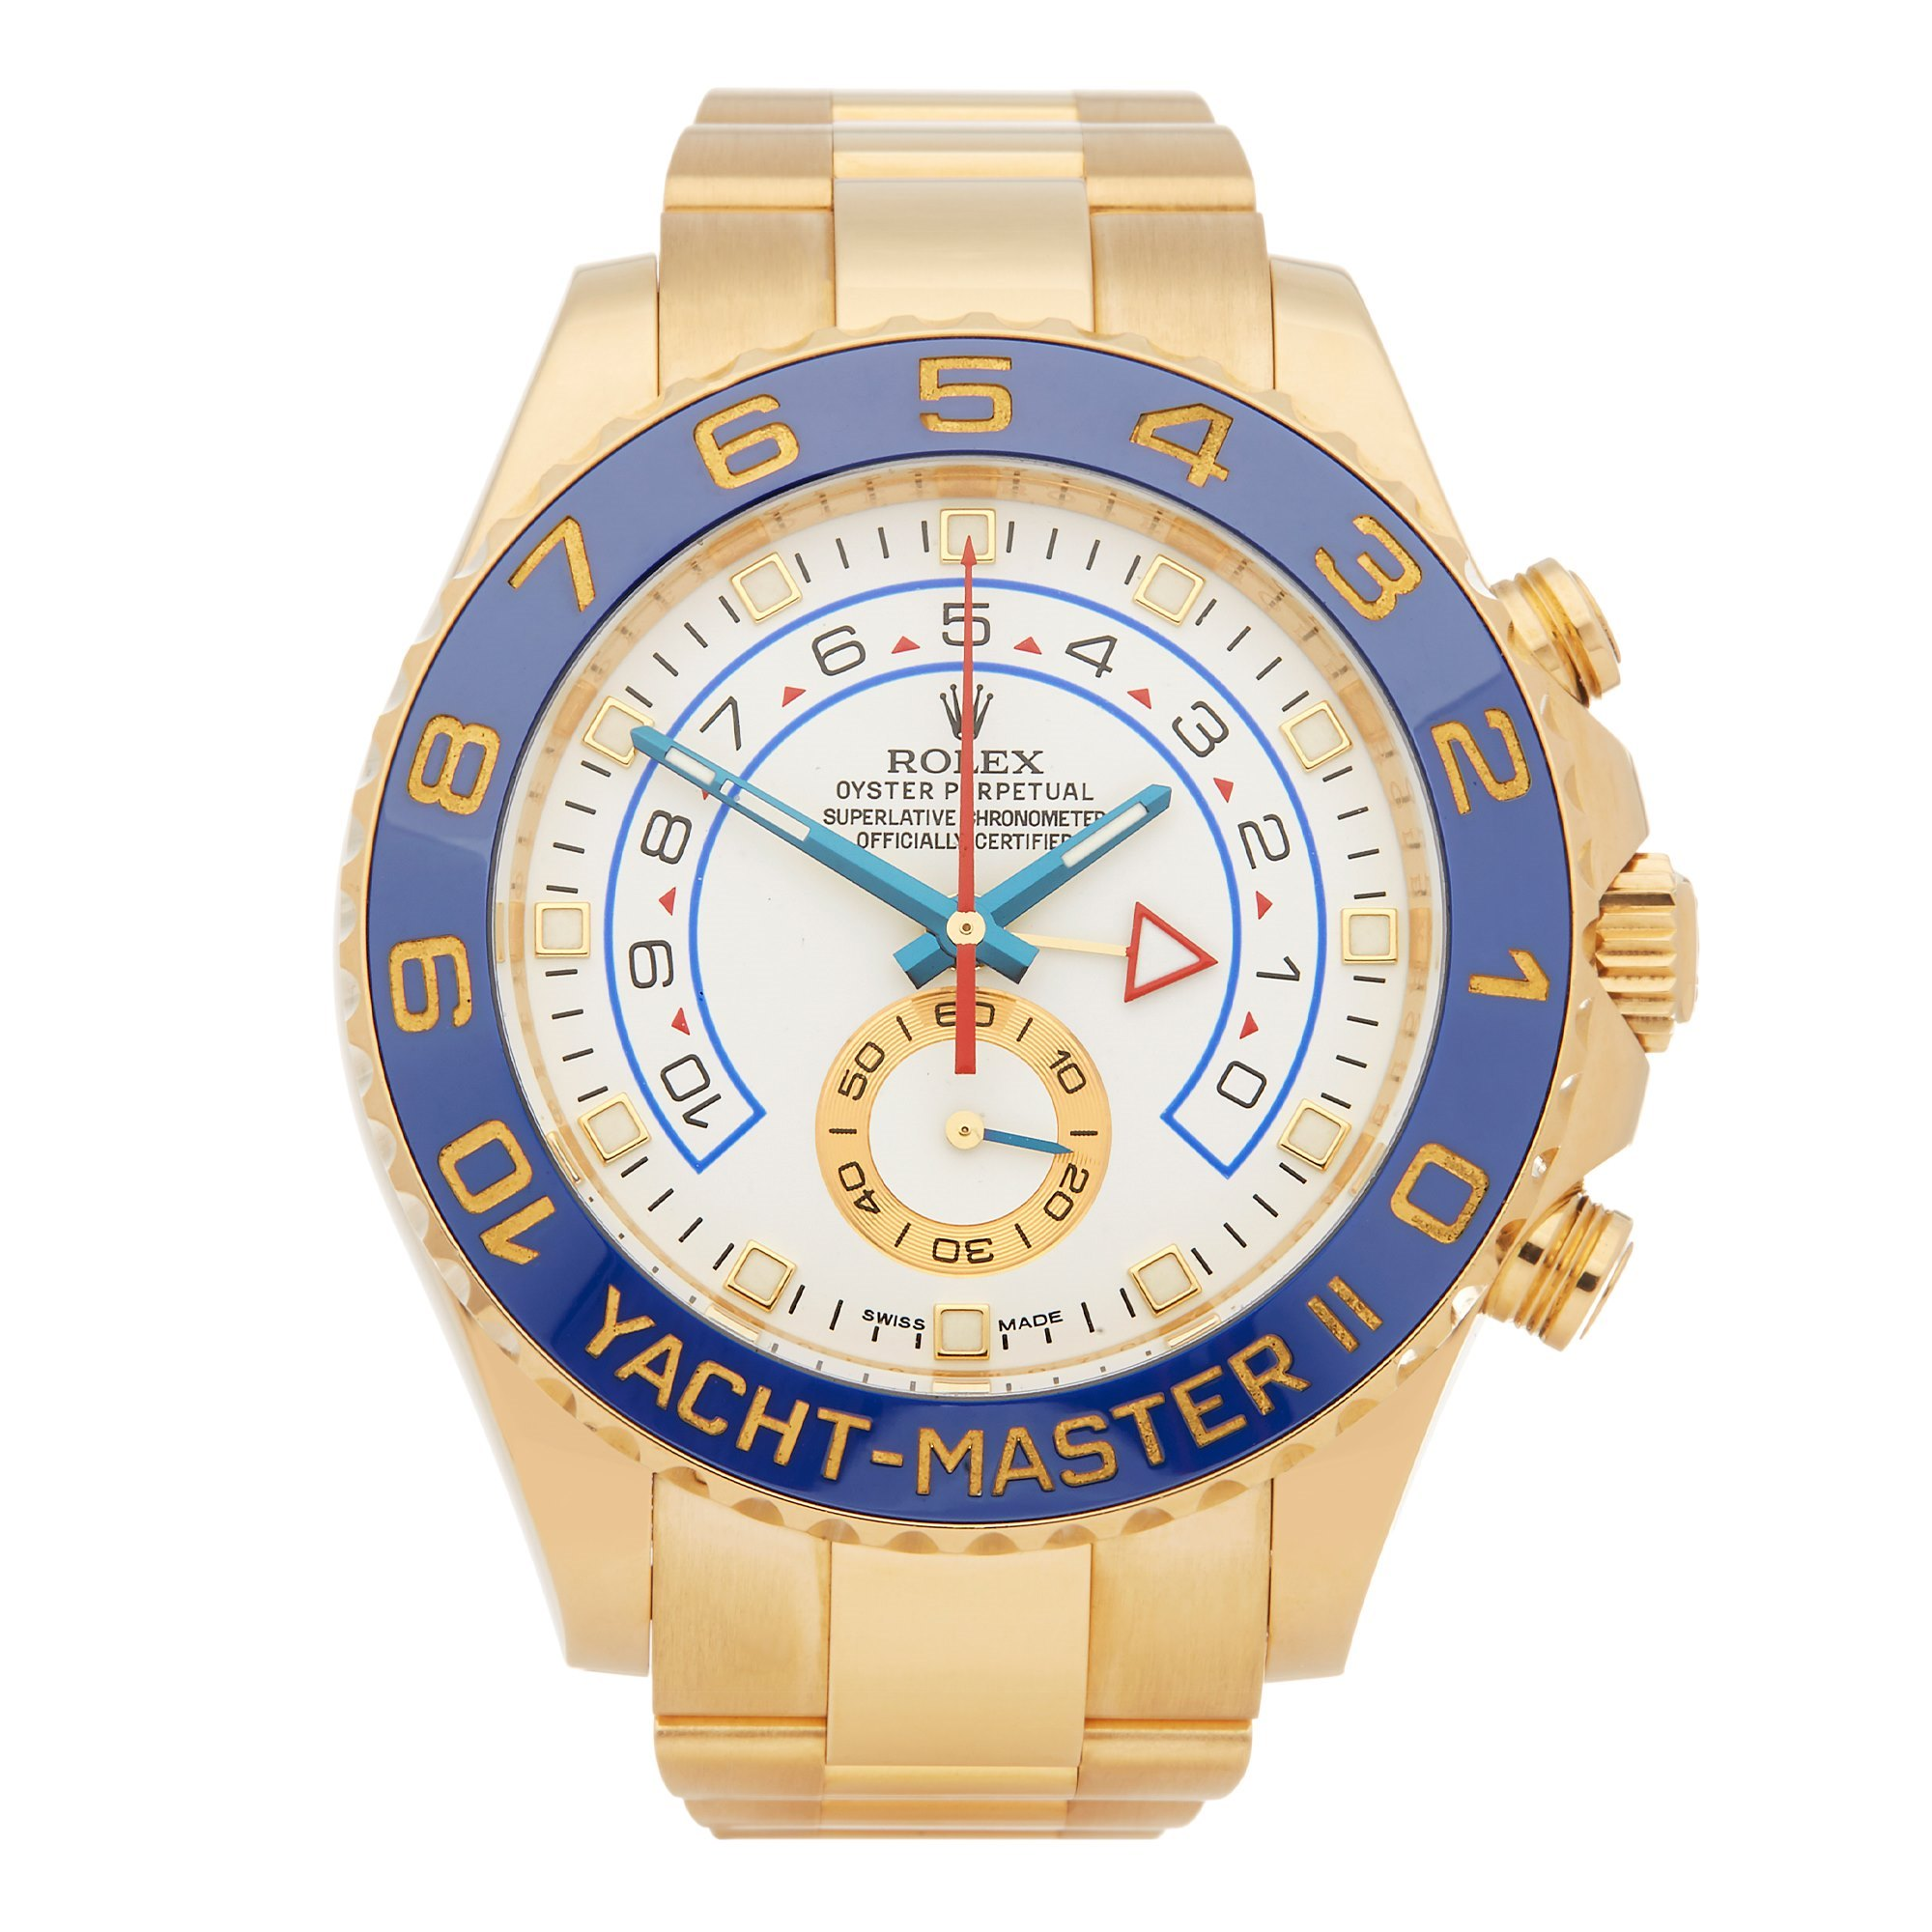 Rolex Yacht-Master II Regatta Chronograph 18K Yellow Gold 116688